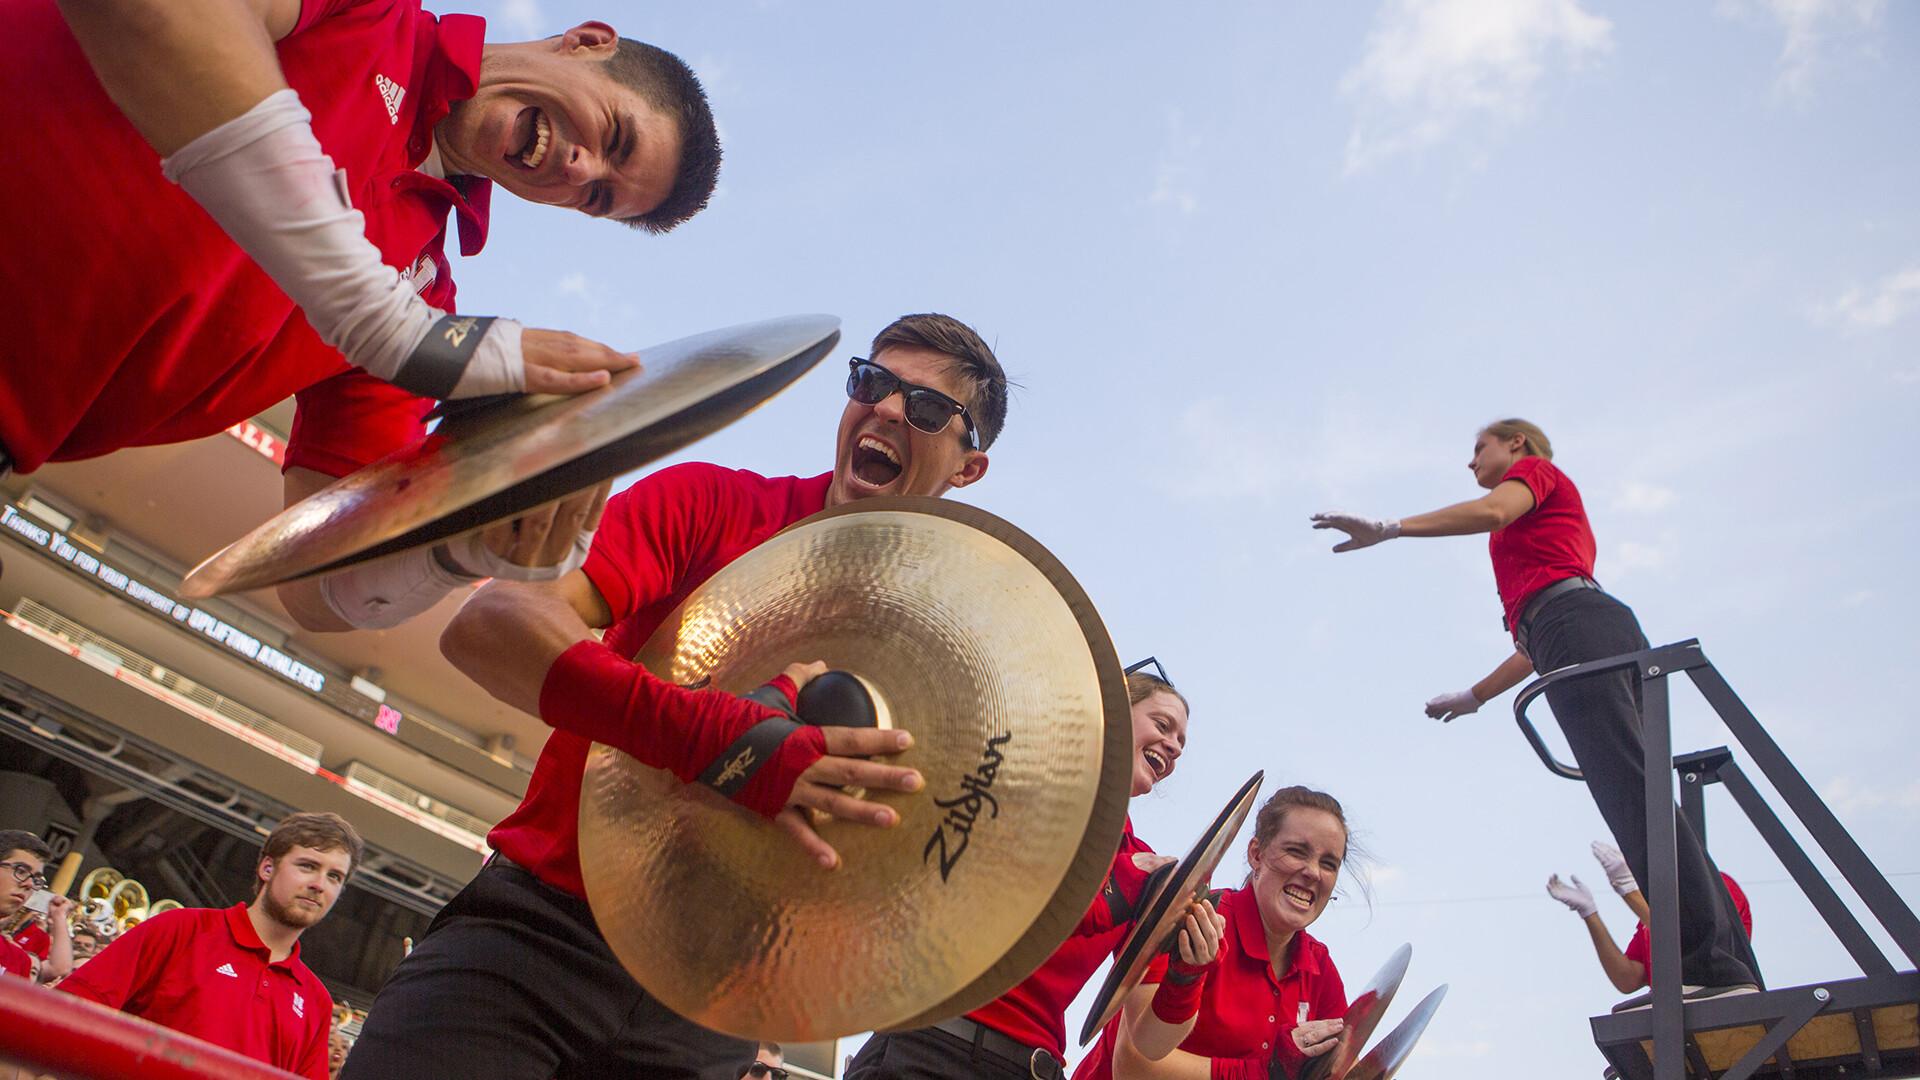 Cornhusker Marching Band makes debut Sept. 2